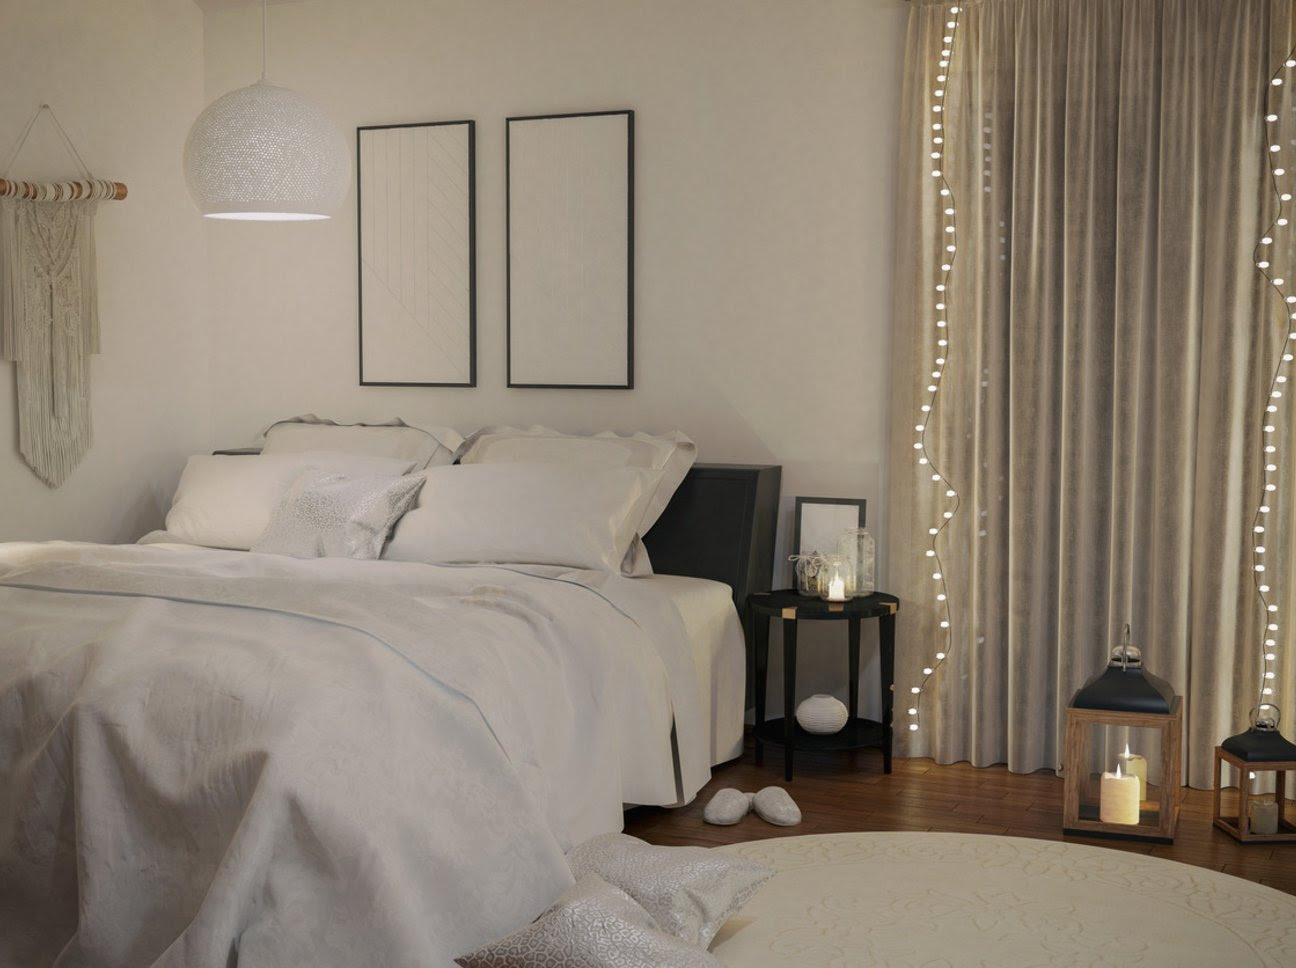 schlafzimmer wanddeko ideen wanddekoration ikea holz